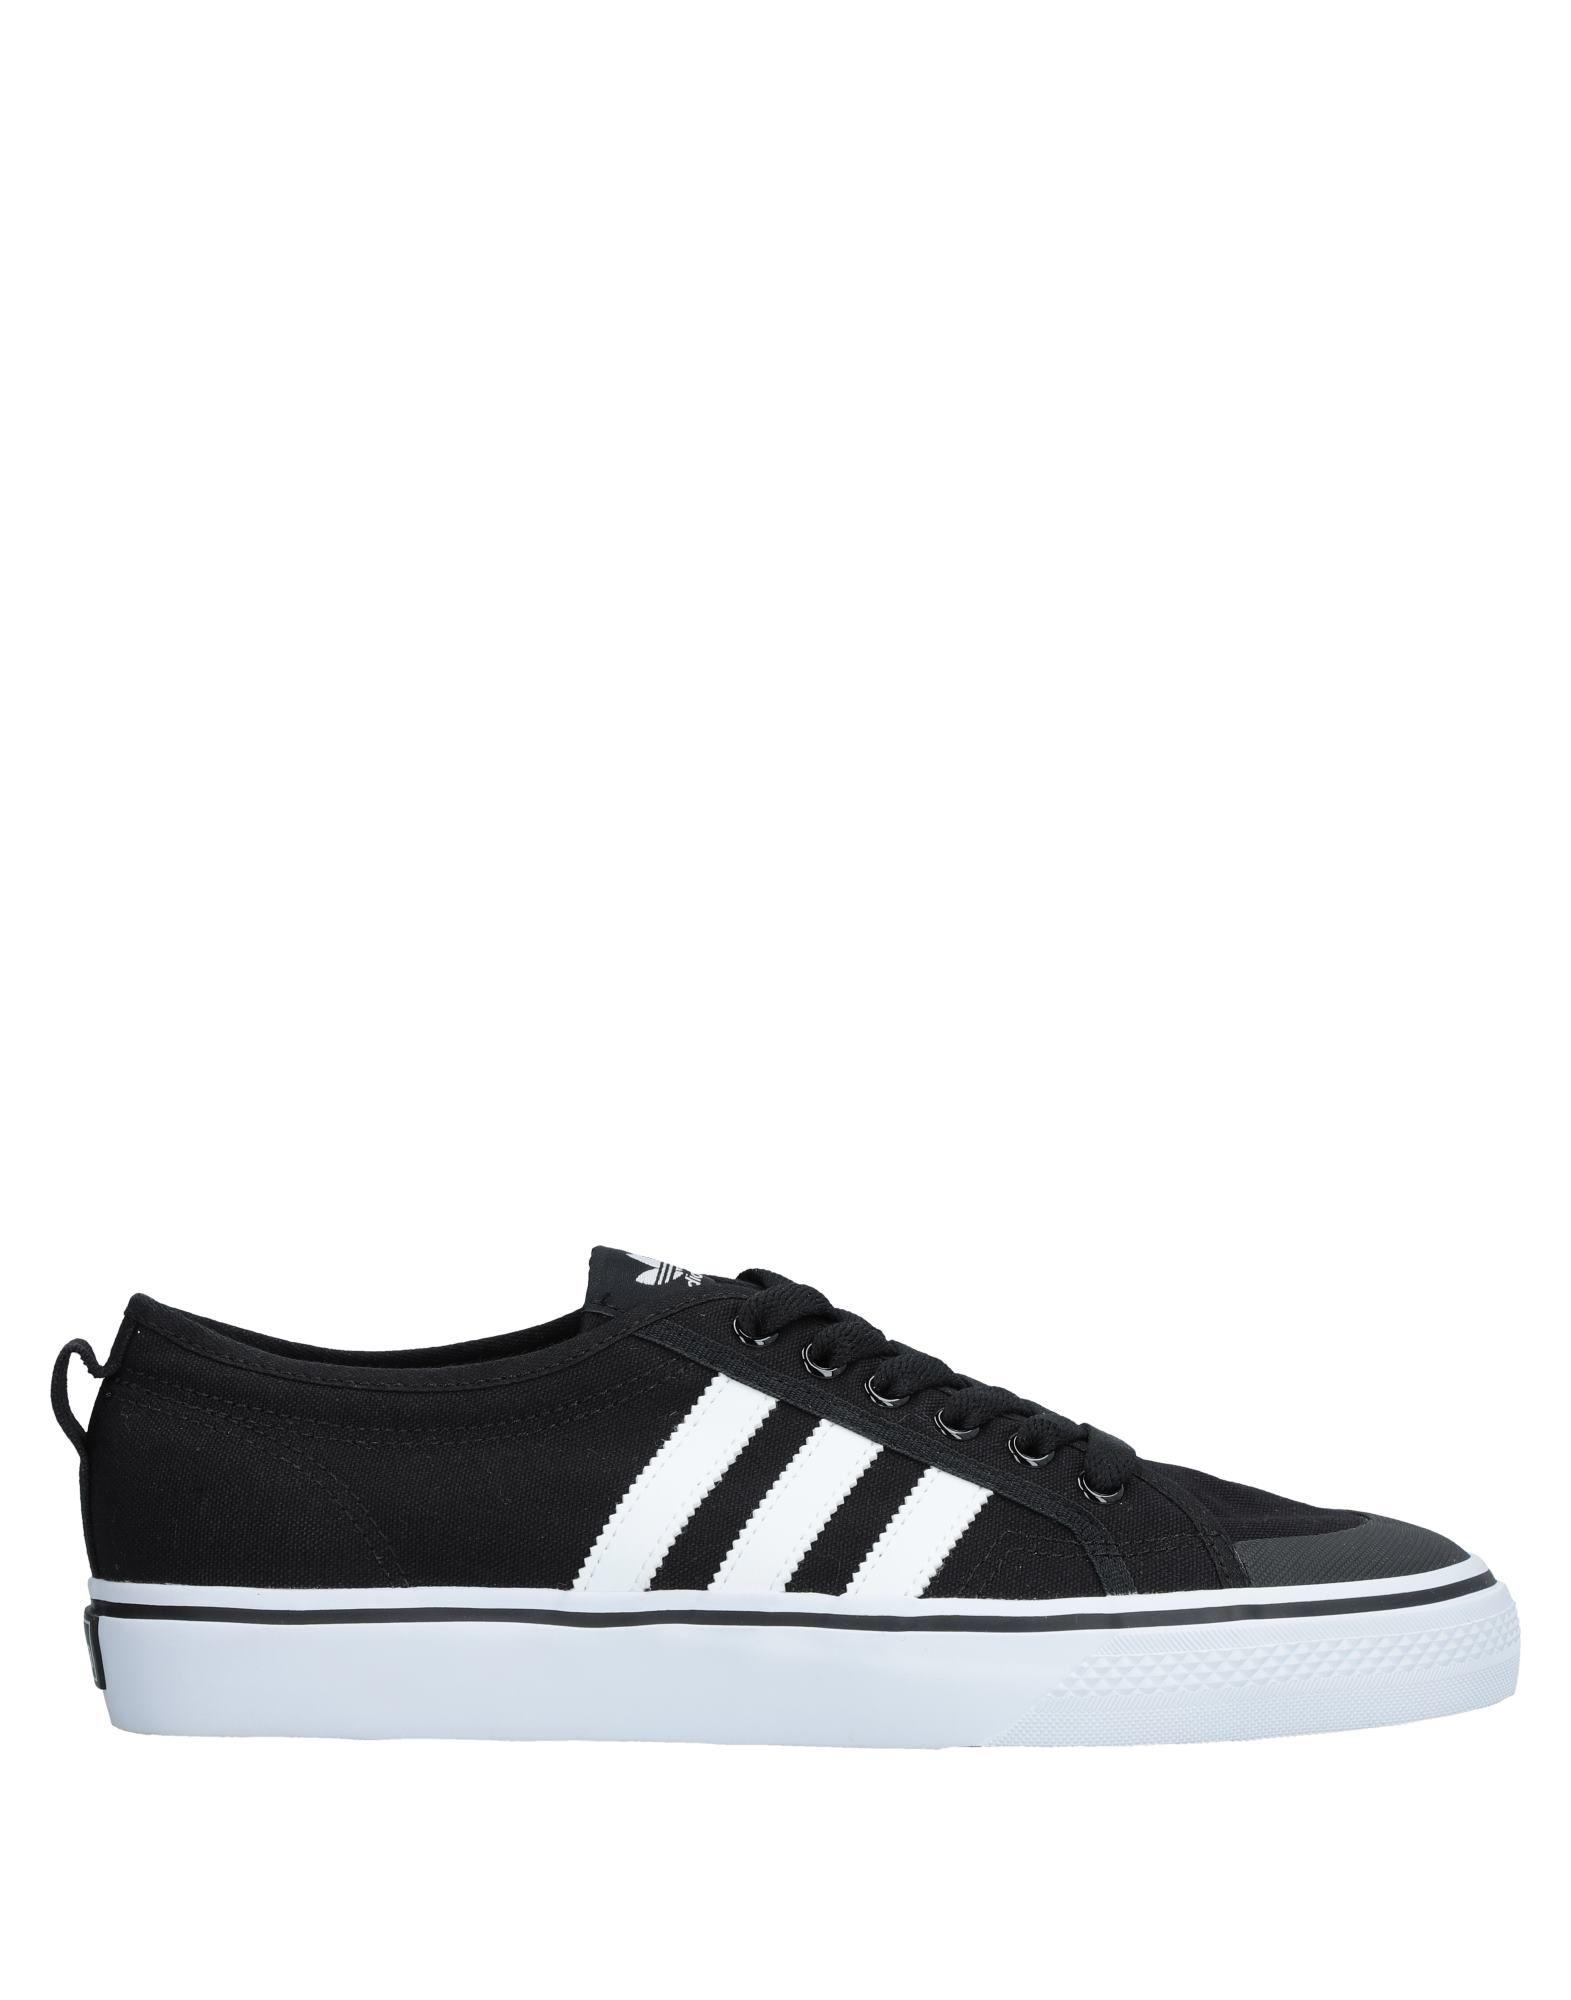 Sneakers Adidas Originals Uomo 11541793QX - 11541793QX Uomo 5409a3